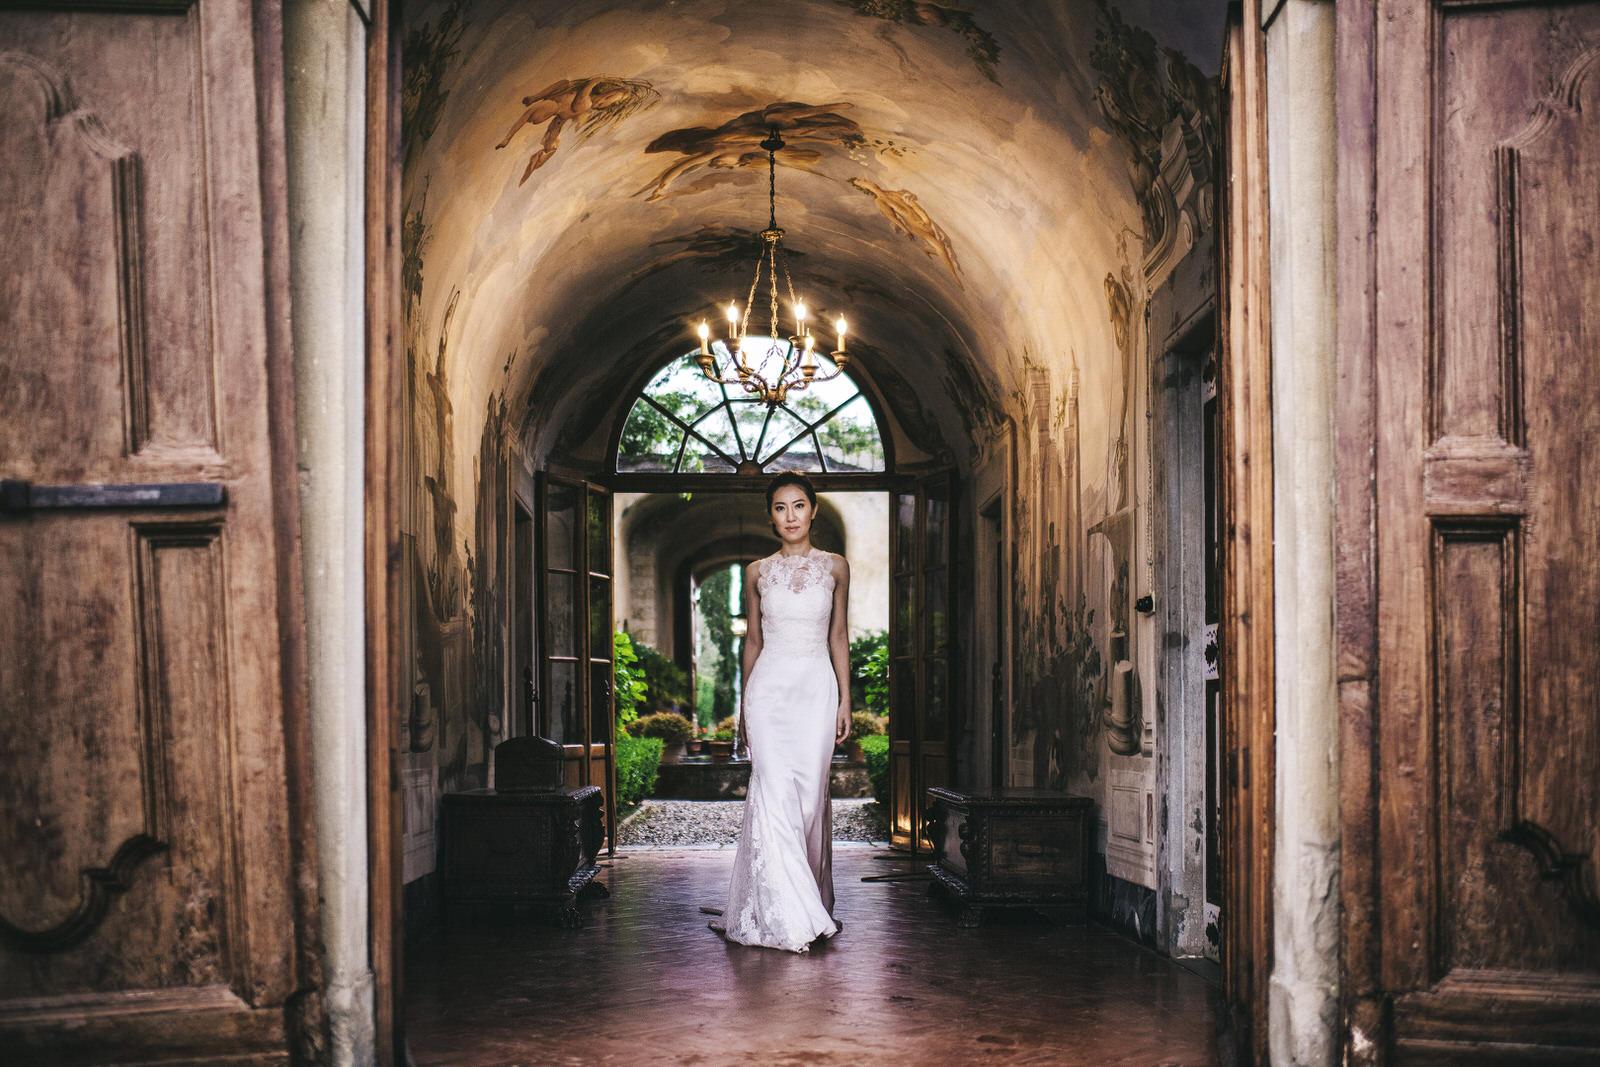 wedding photographer in italy-venice-tuscany-florence-amalfi coast-como lake-villa del balbianello-siena-amalfi-ravello-belmond-villa cimbrone39